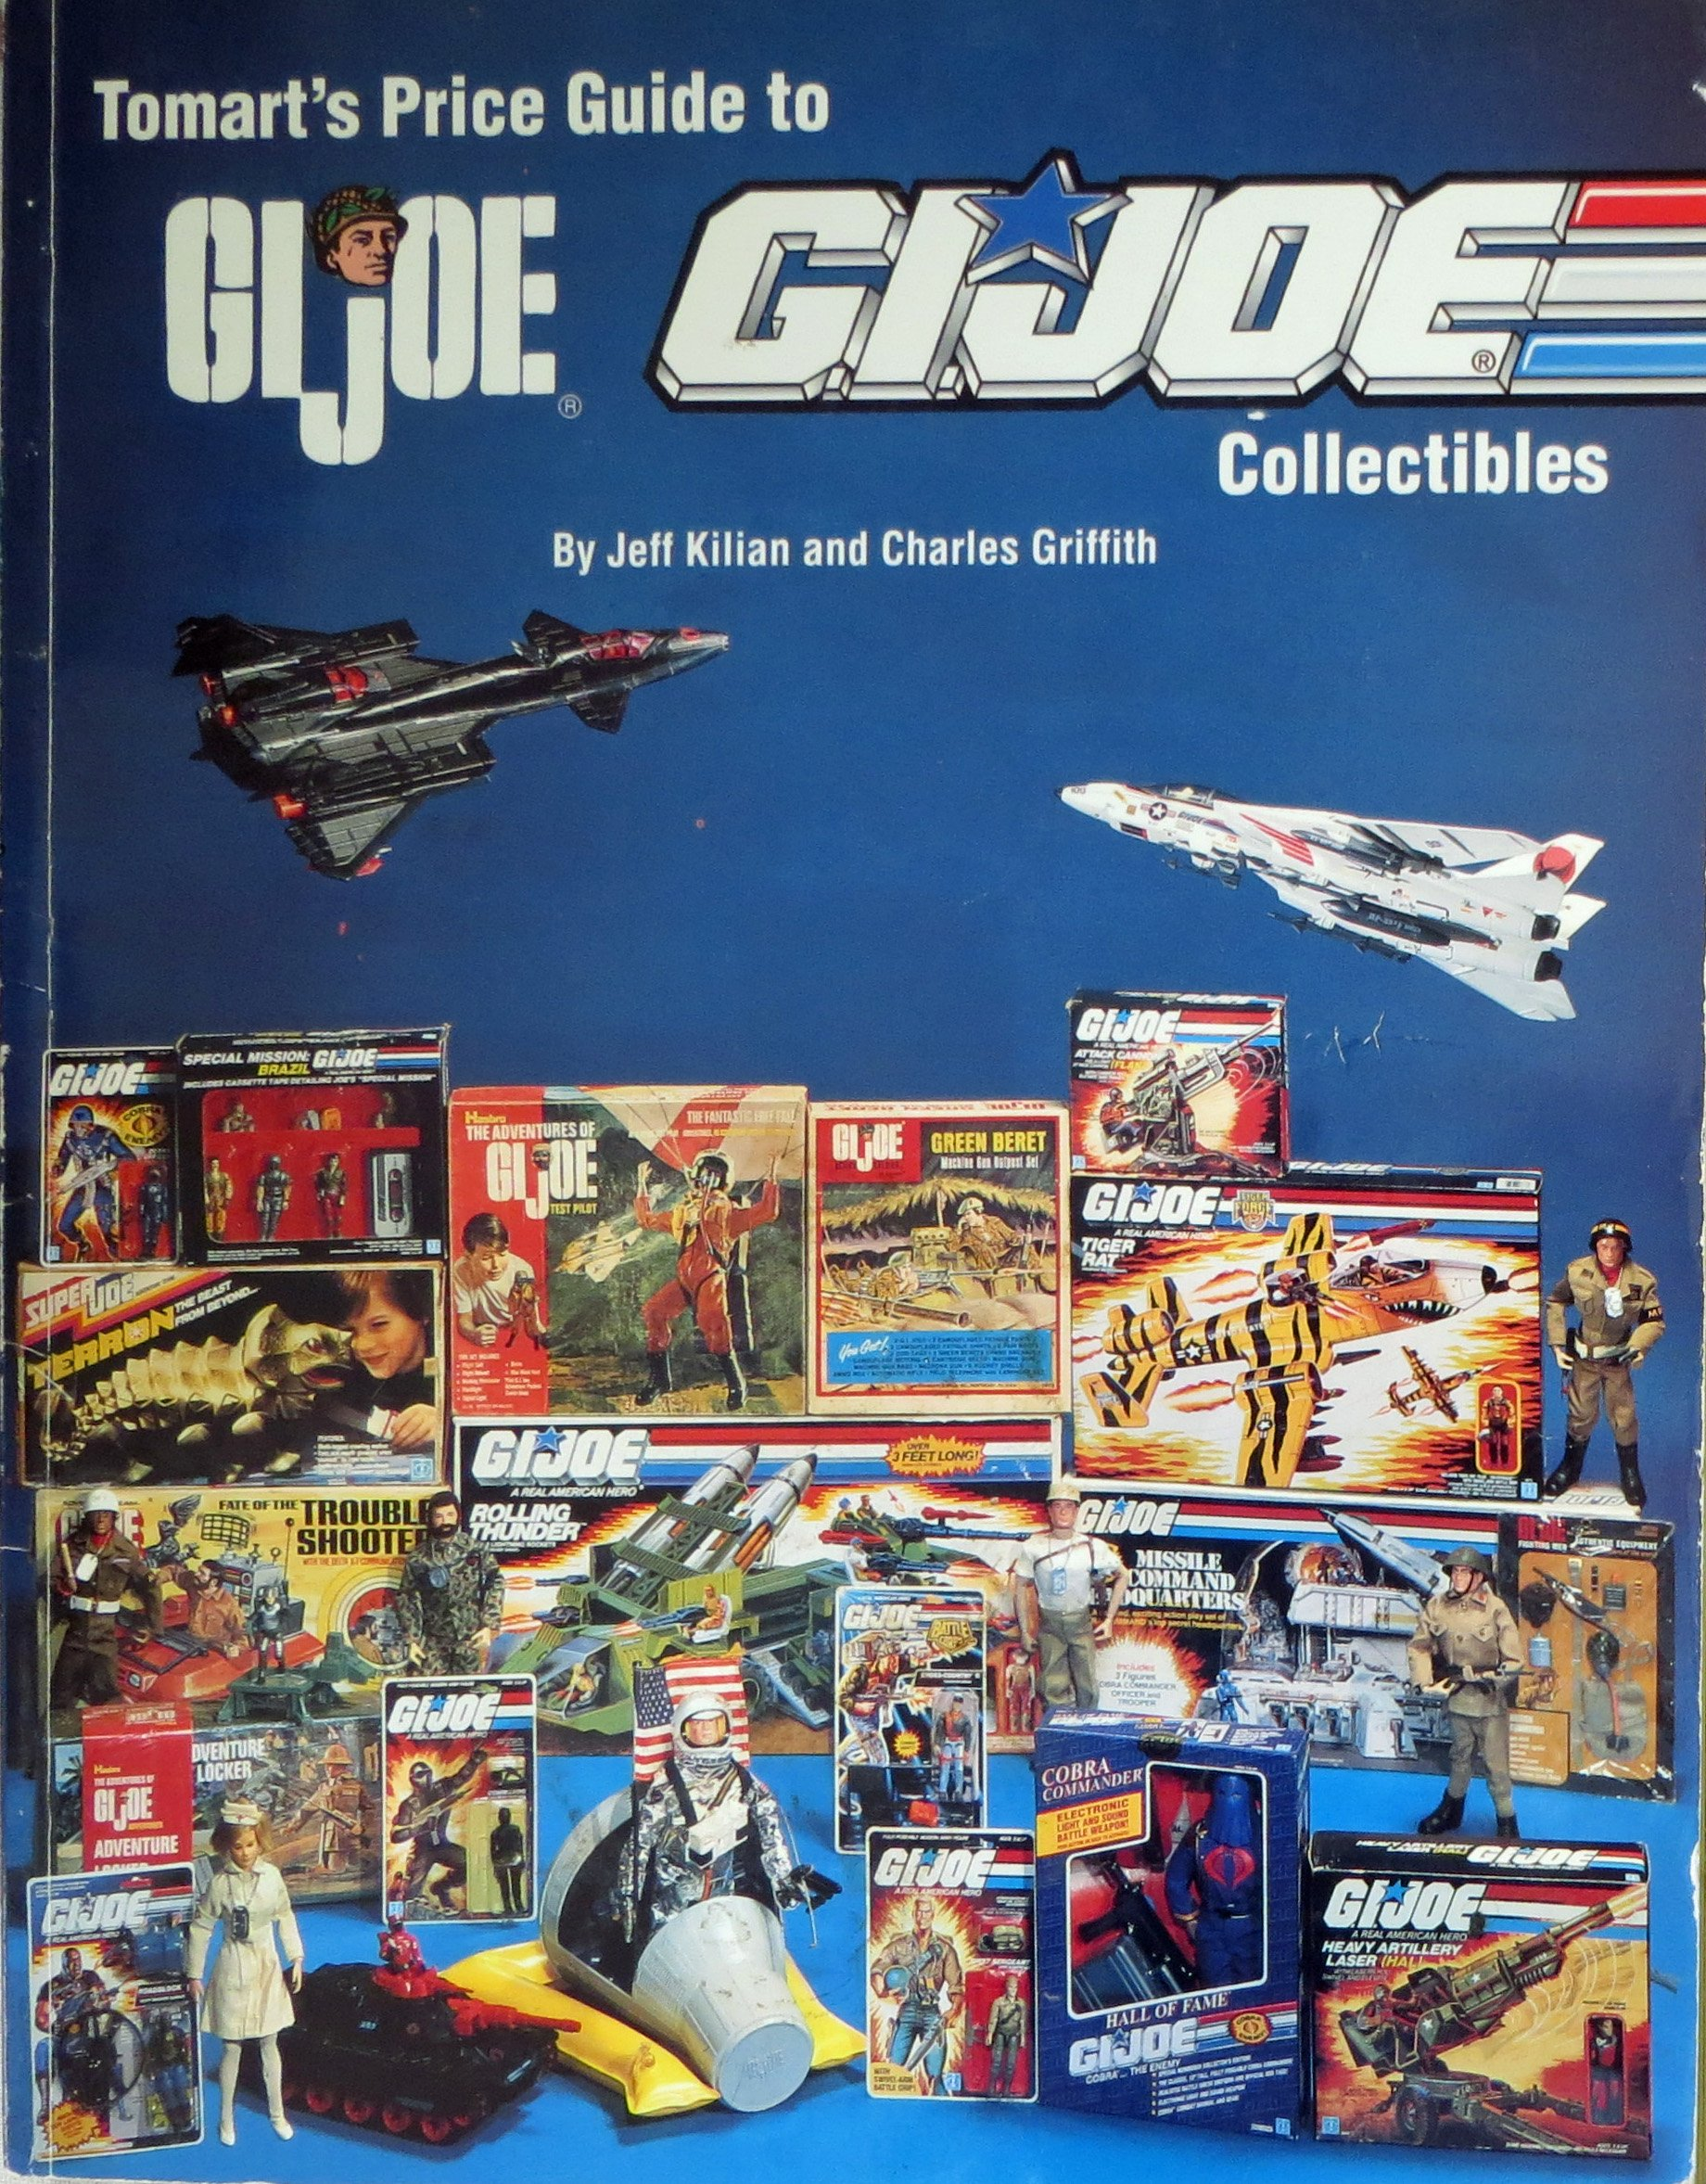 1964 GI Joe Electronic Collectors Guide